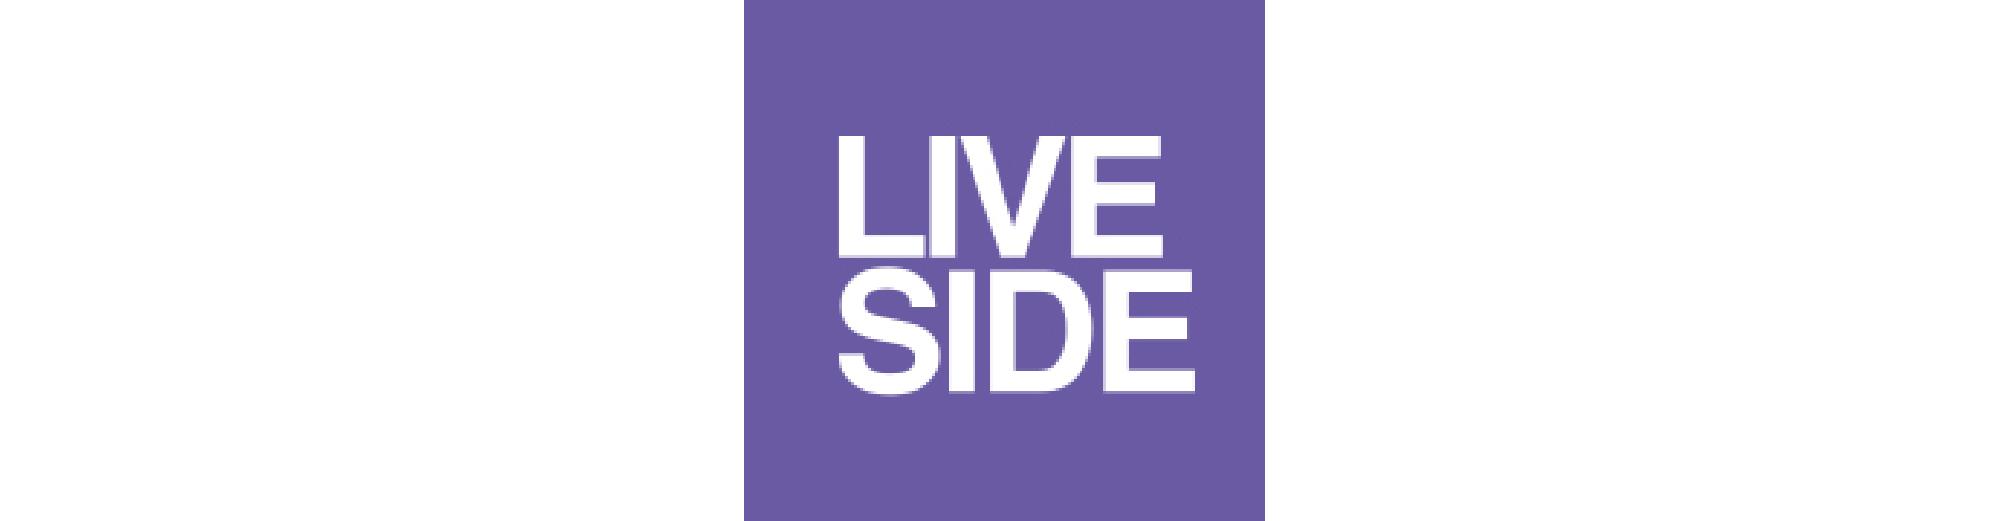 logo_liveside